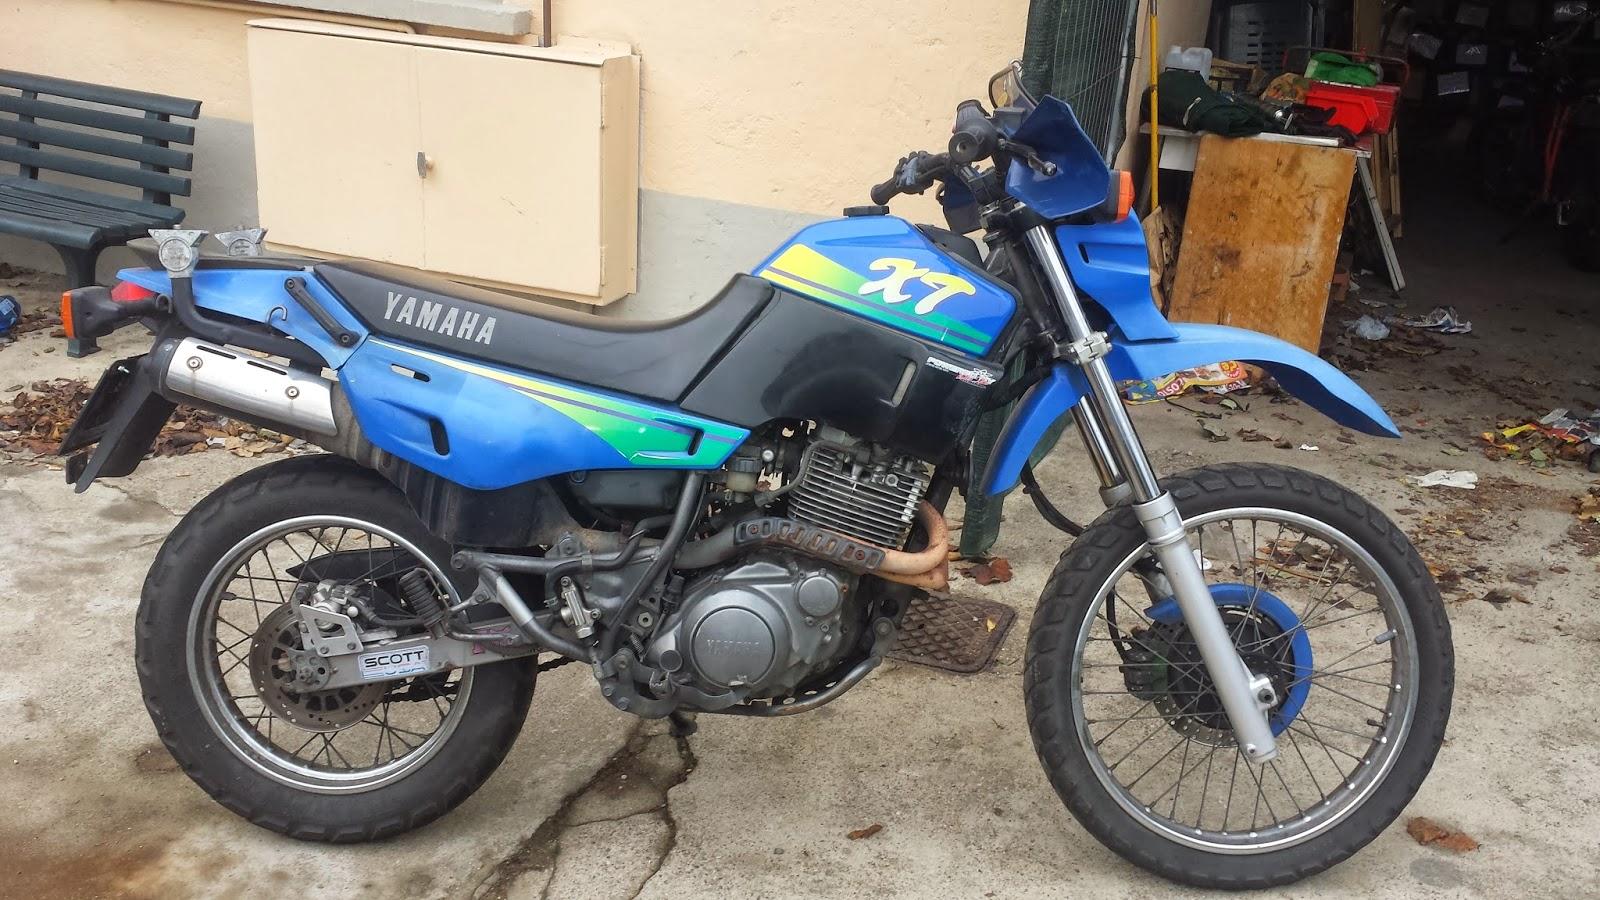 Schema Elettrico Yamaha Xt 600 : Schema elettrico xt tb club tenere italia